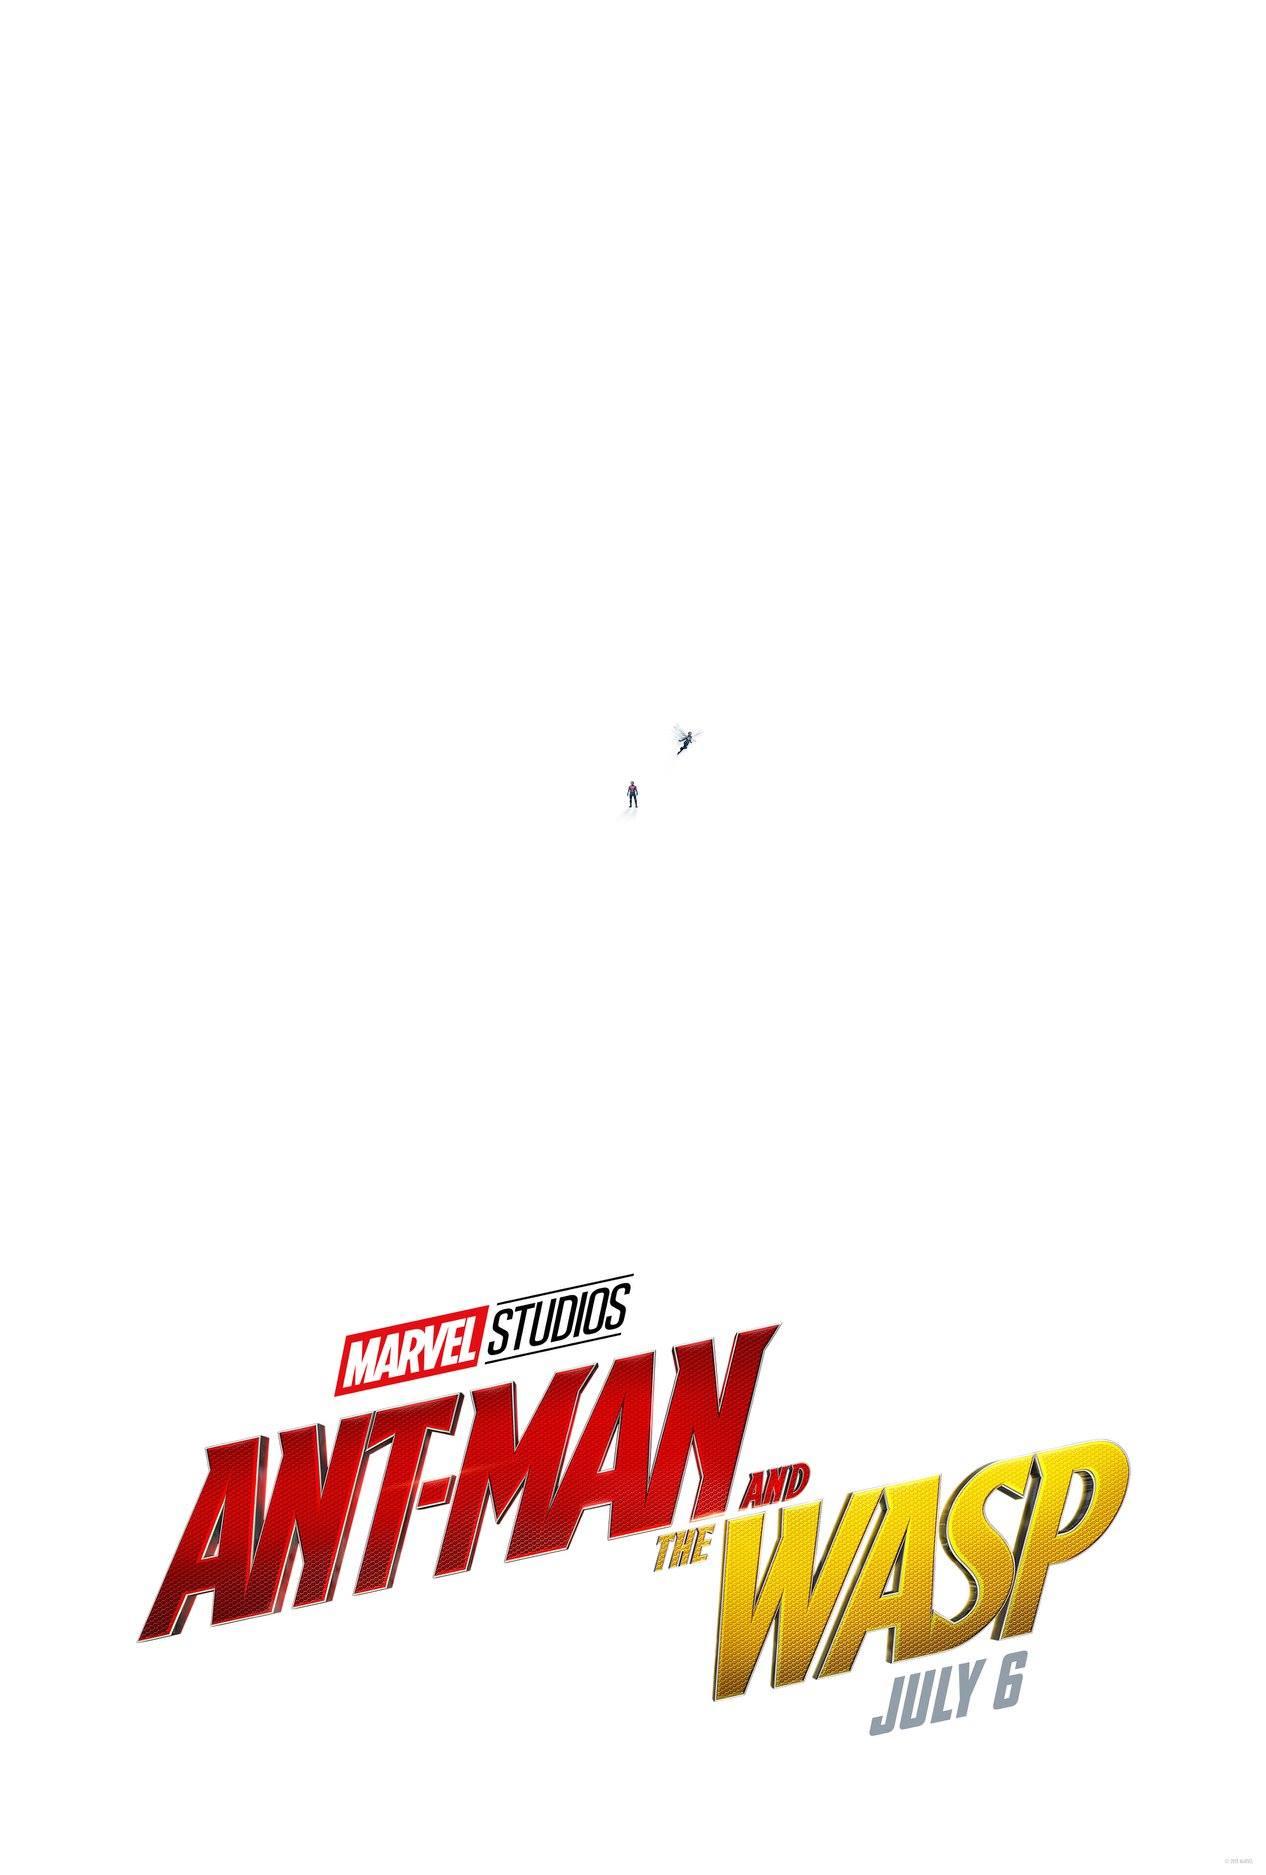 Prvý oficiálny plagát na 18. marvelovku Ant-Man and the Wasp